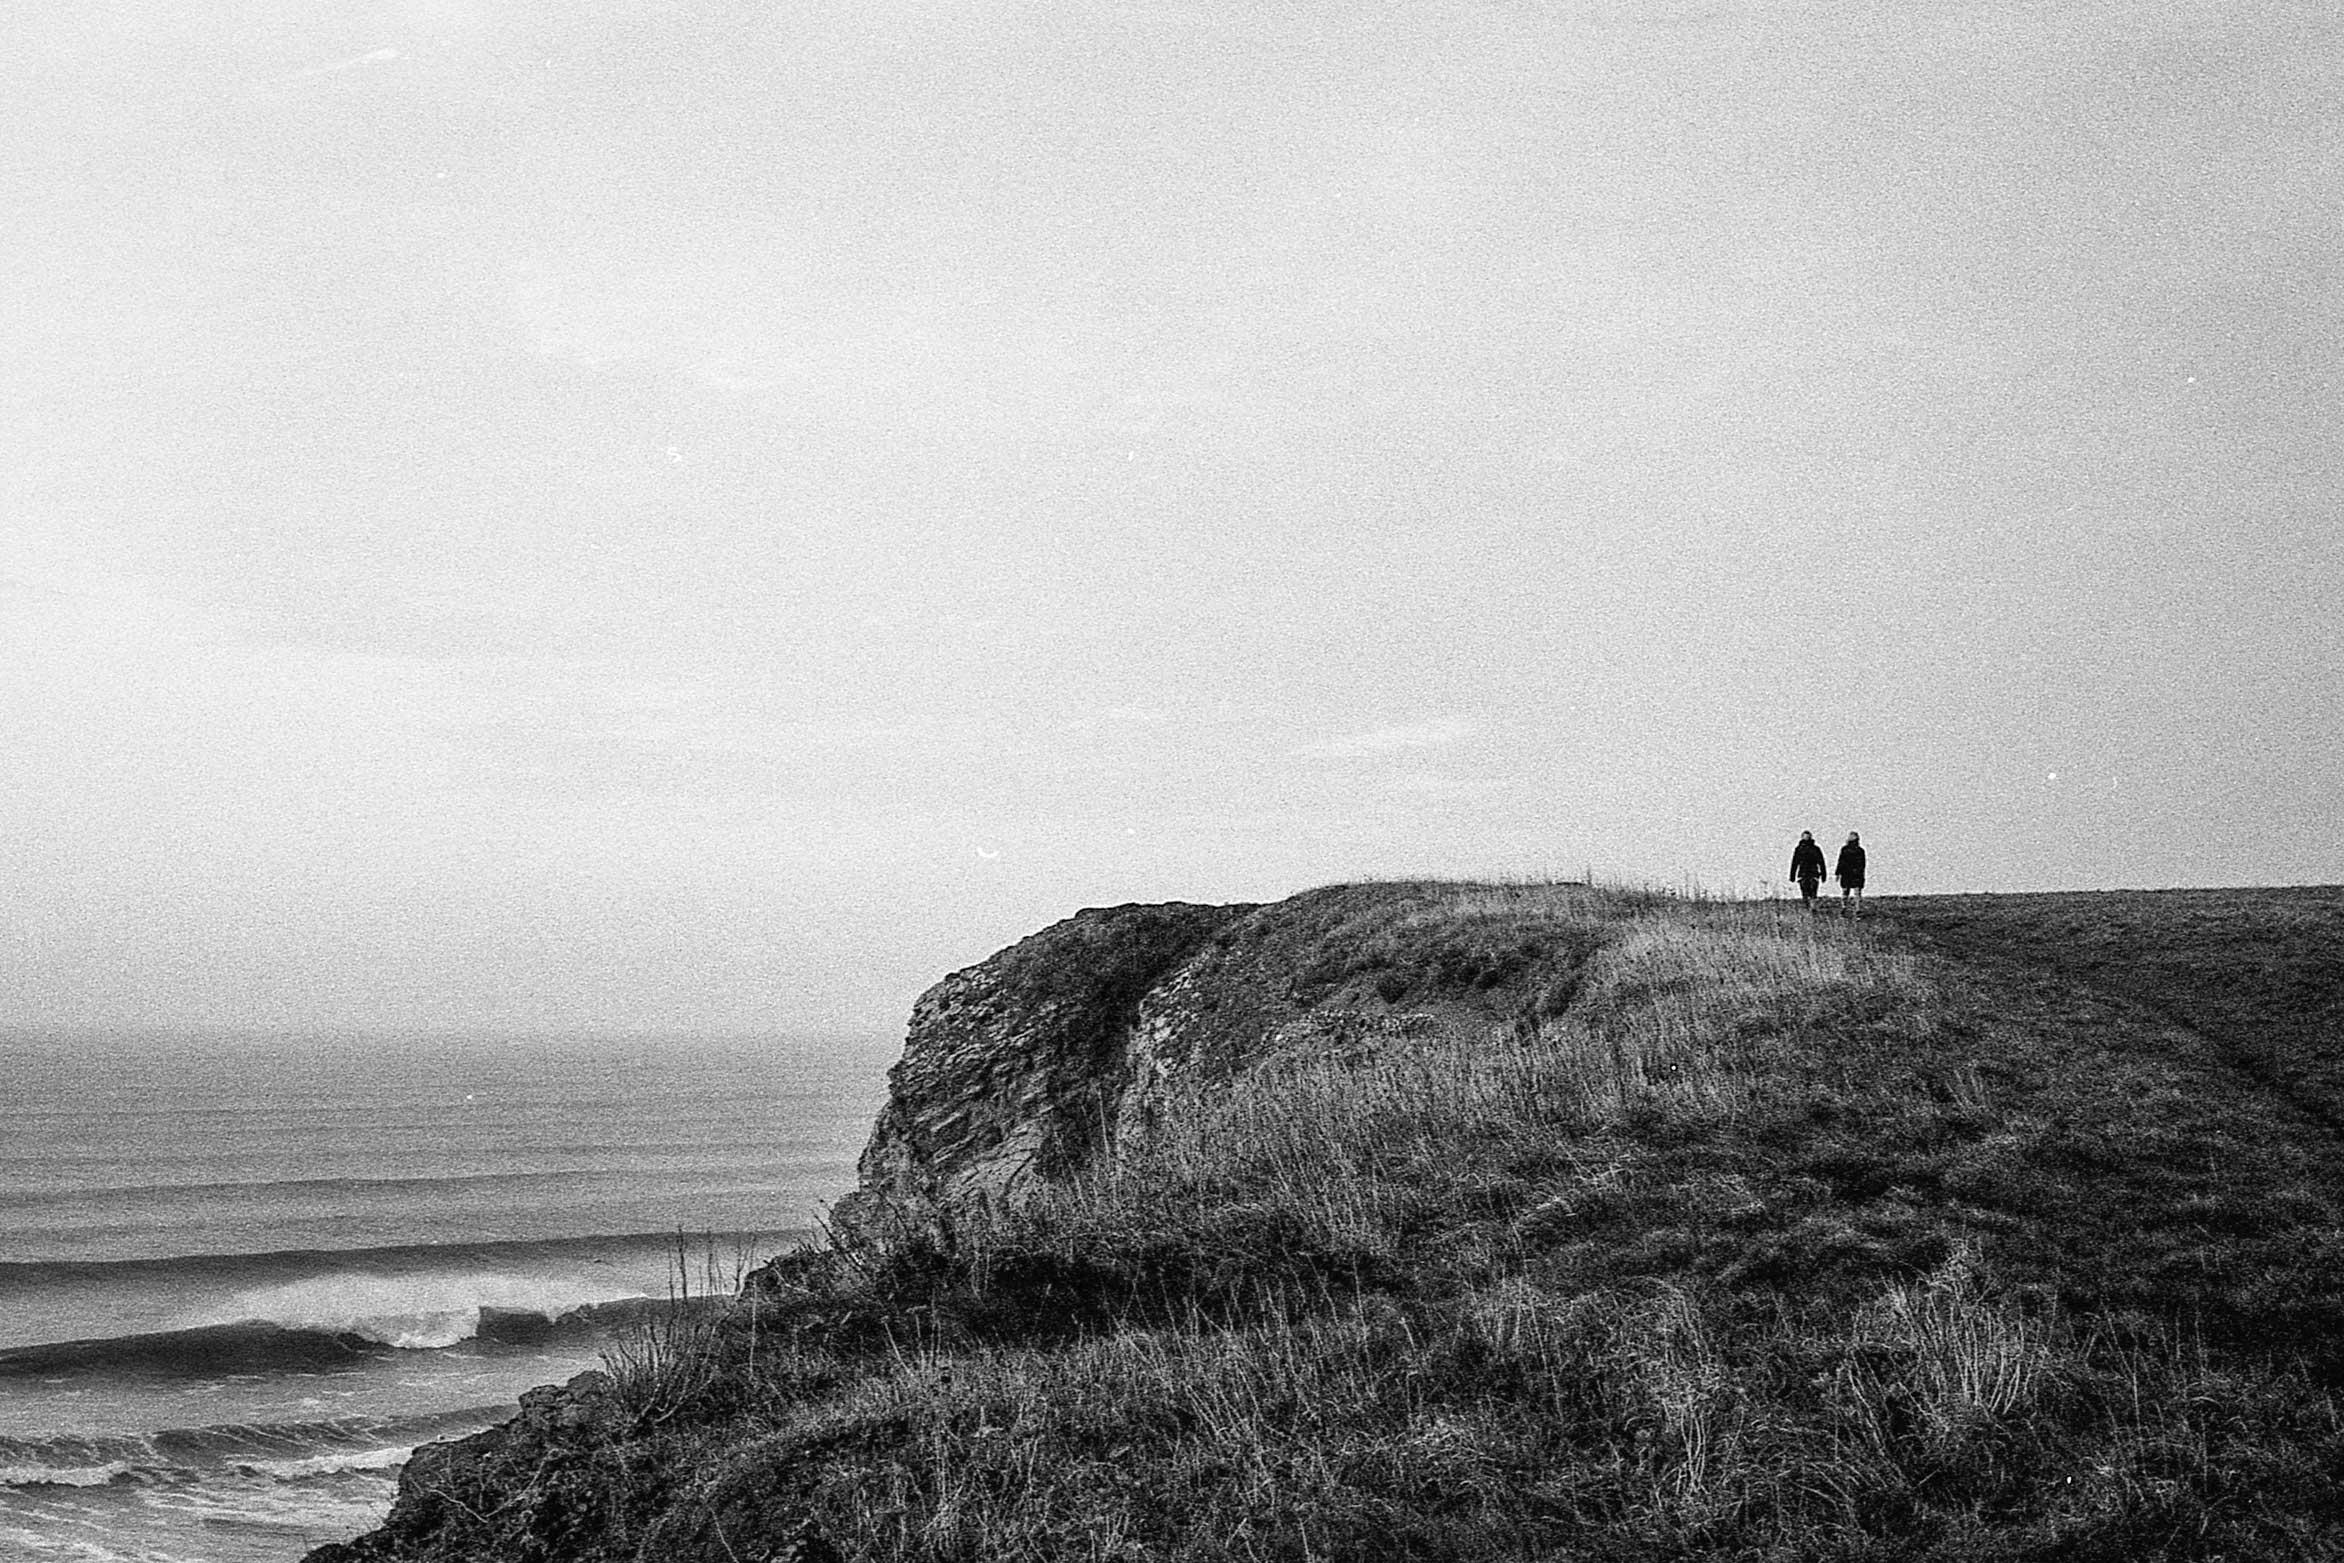 cornwall-landscapes-28.jpg